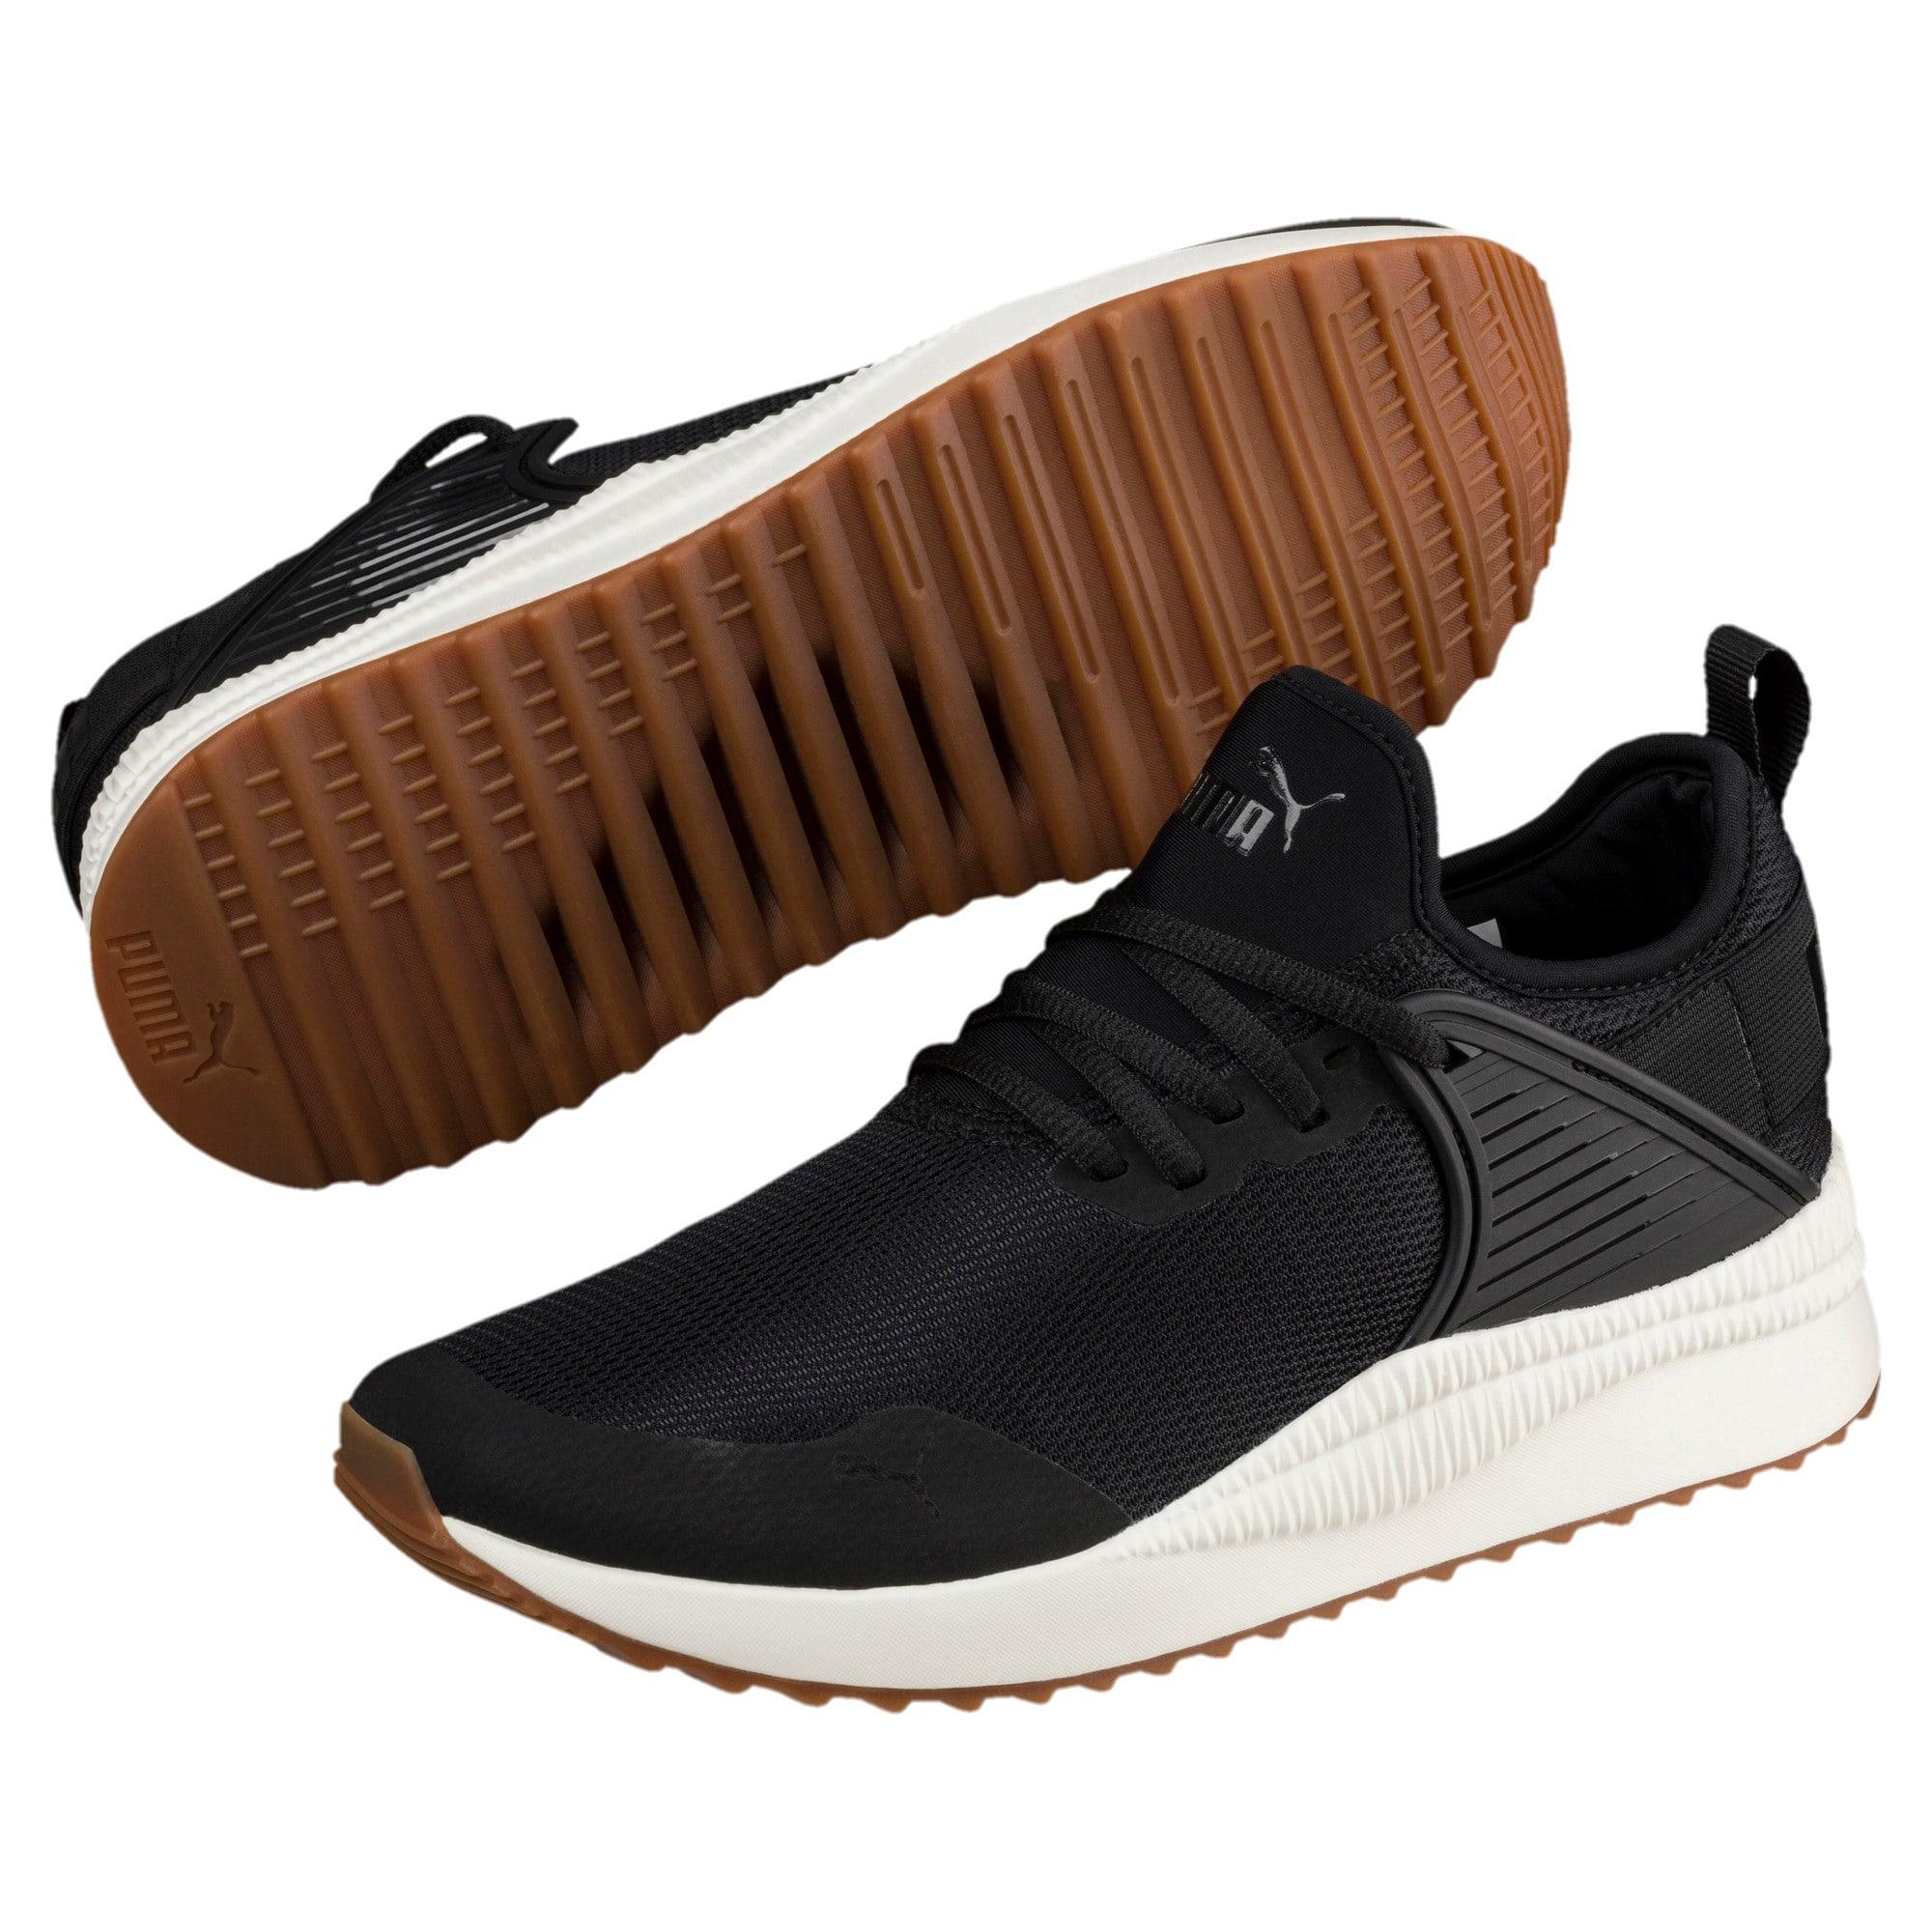 Thumbnail 2 of Pacer Next Cage Sneakers, P. Black-P. Black-Whis.White, medium